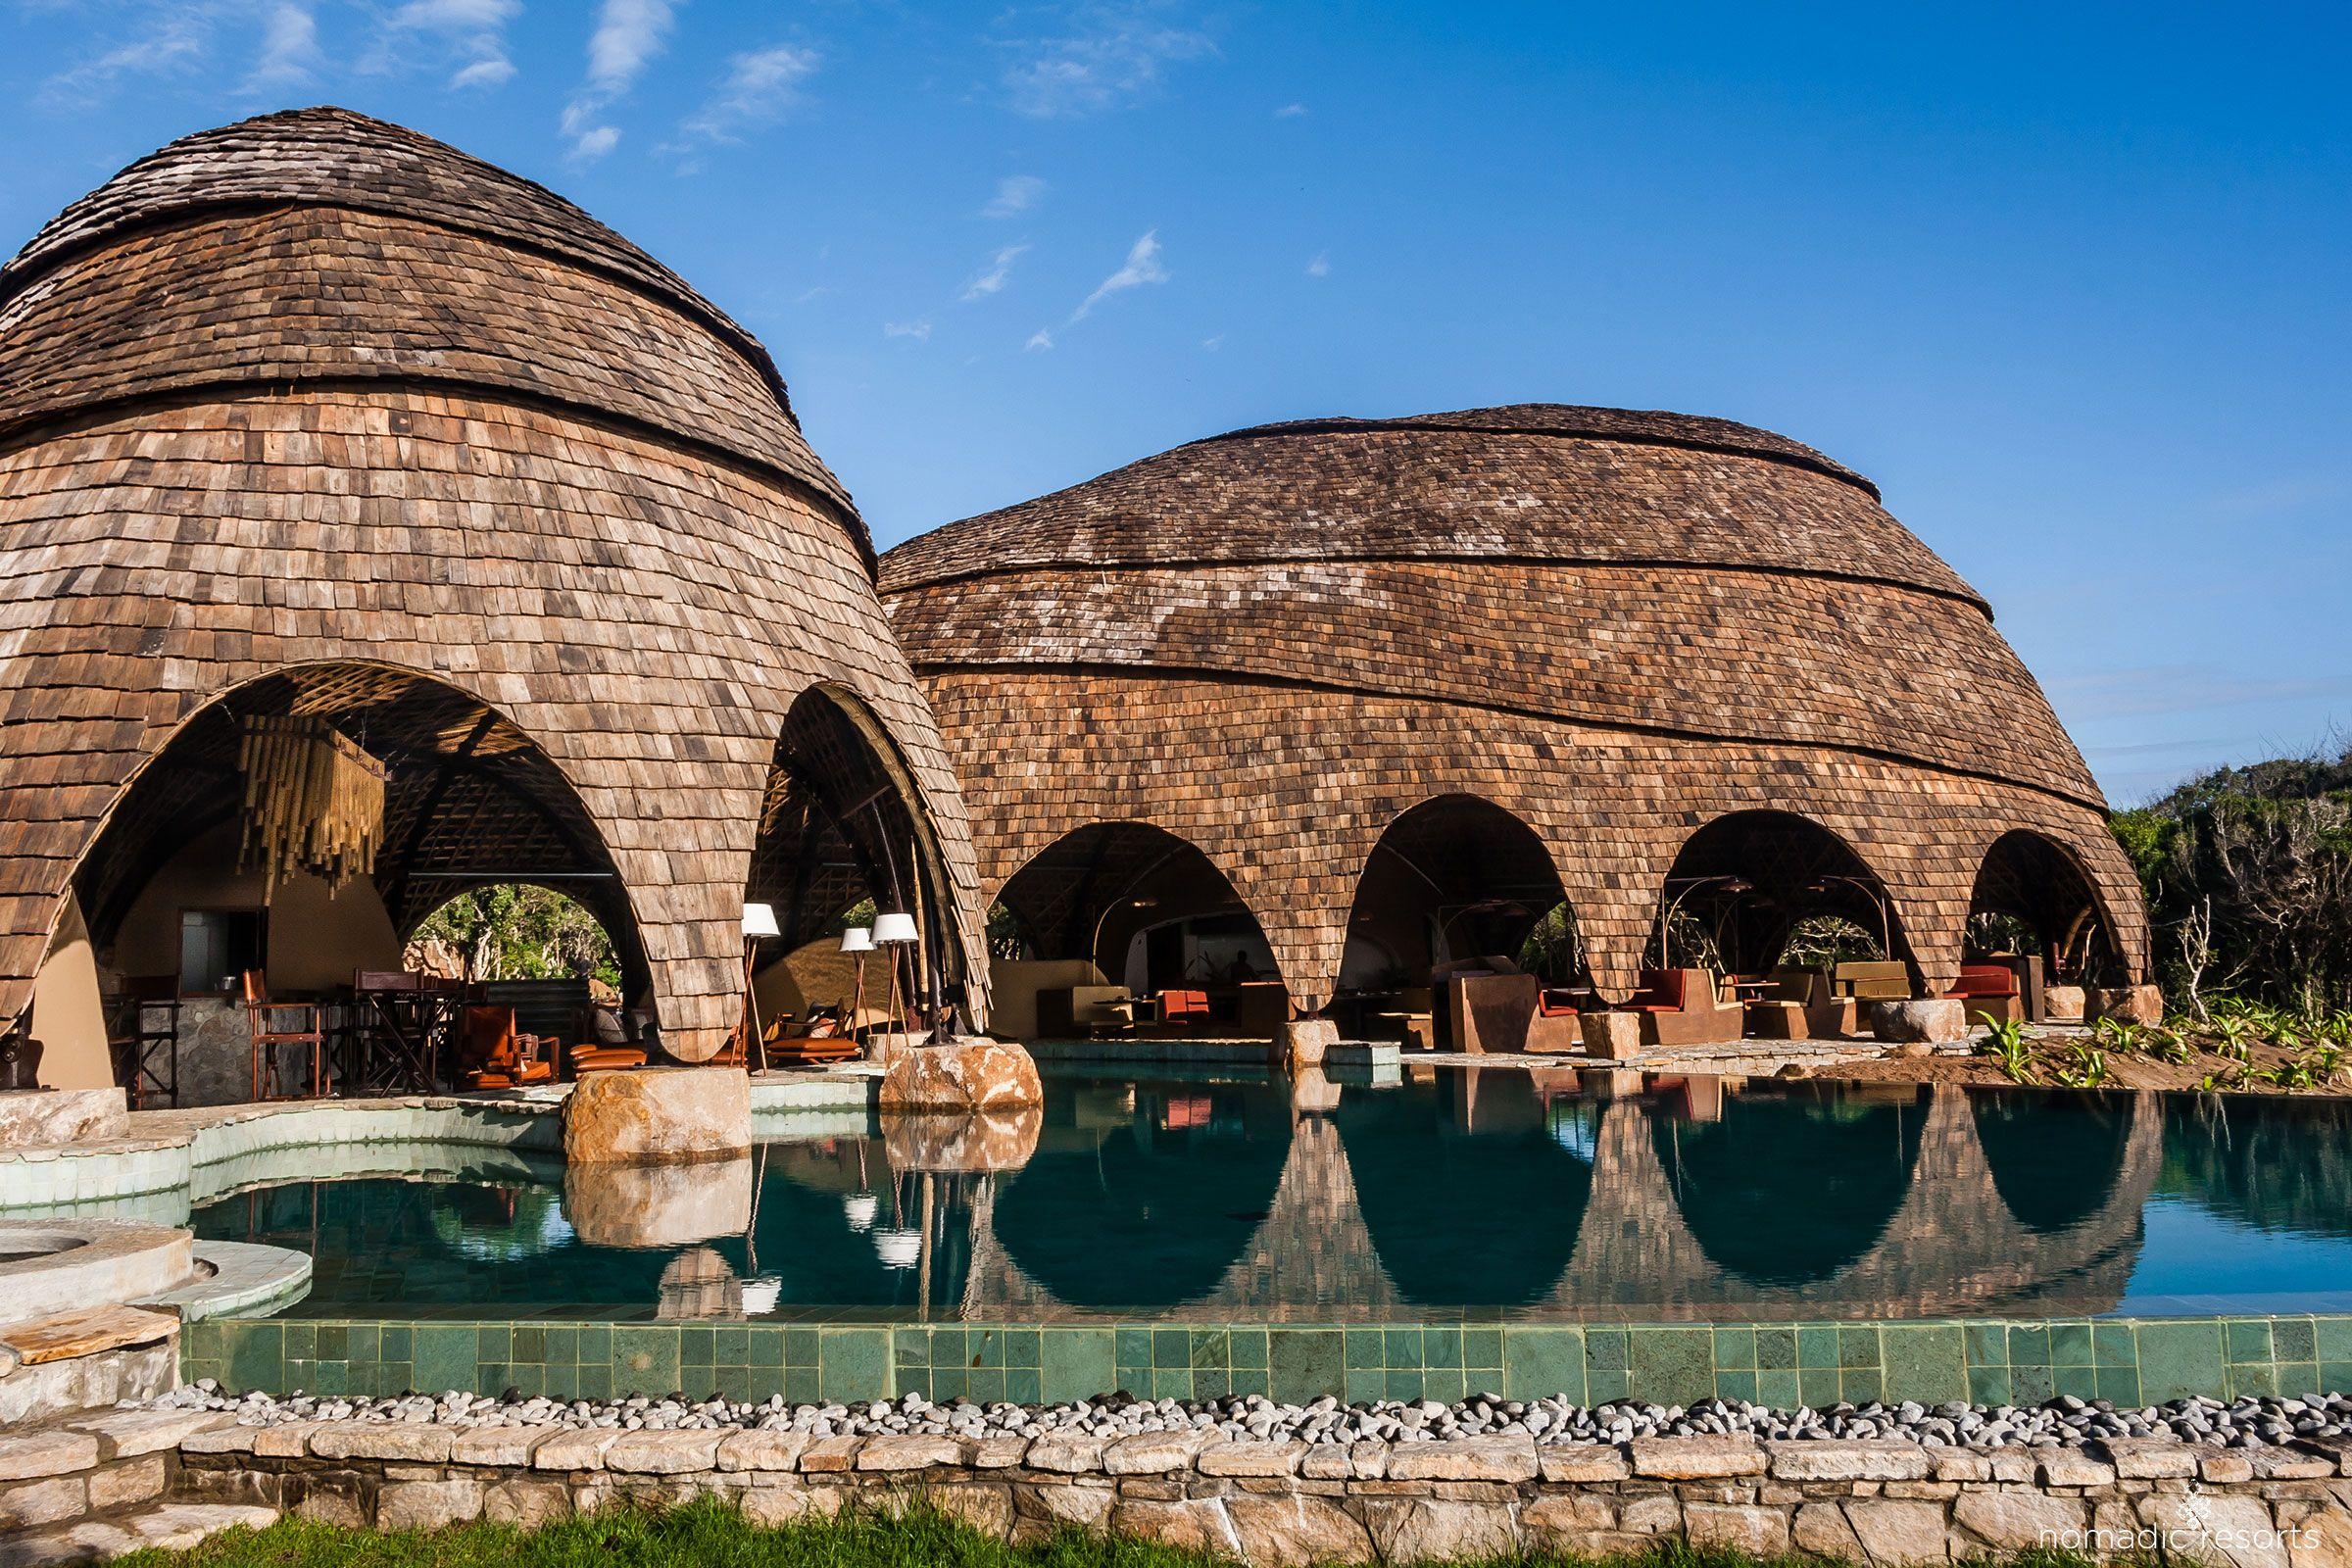 wild coast tented lodge, bar restaurant and pool exterior, yala national park, sri lanka